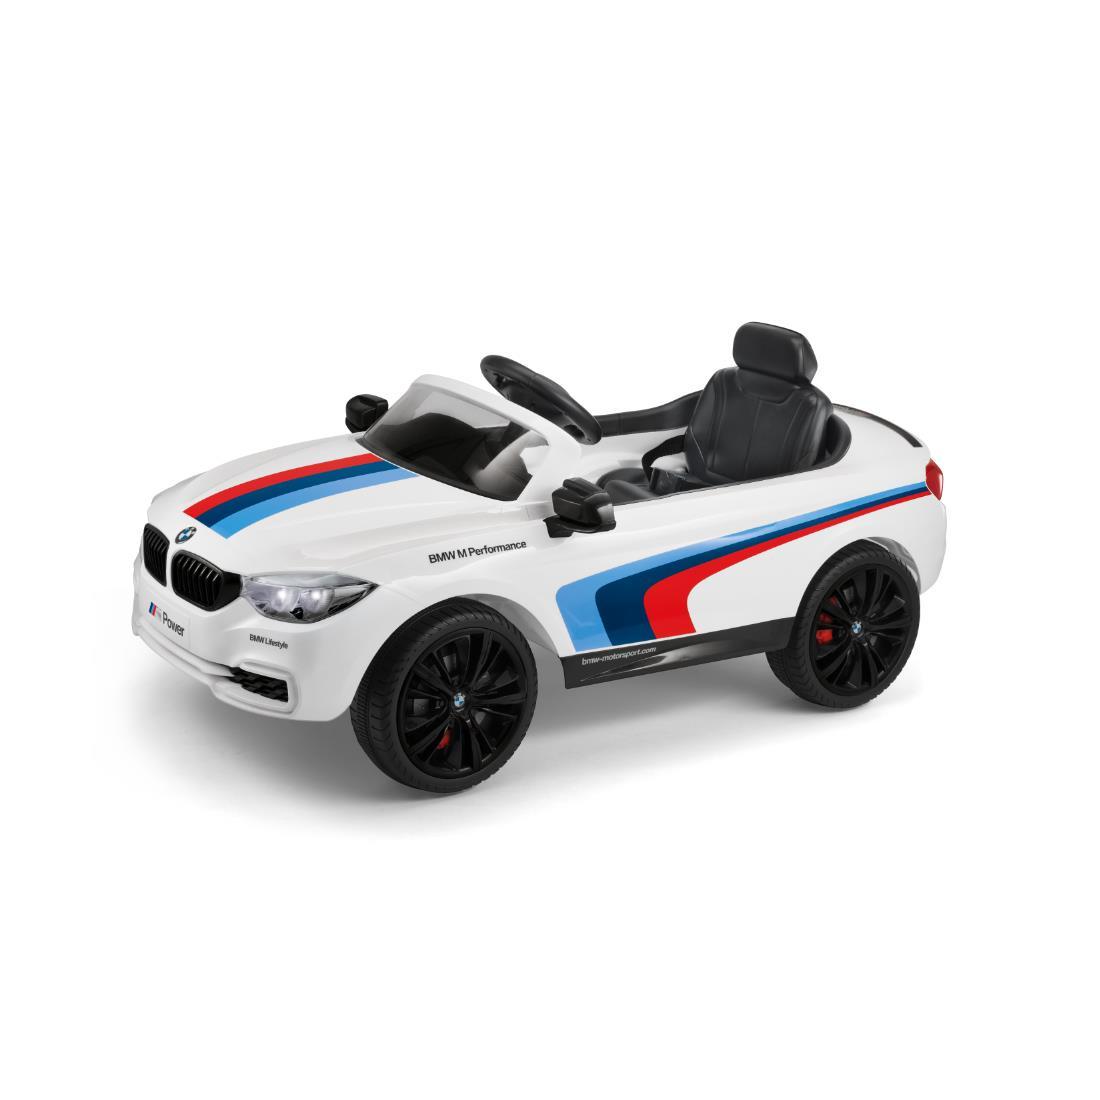 Bmw M4 Motorsport Electric Ride On Car